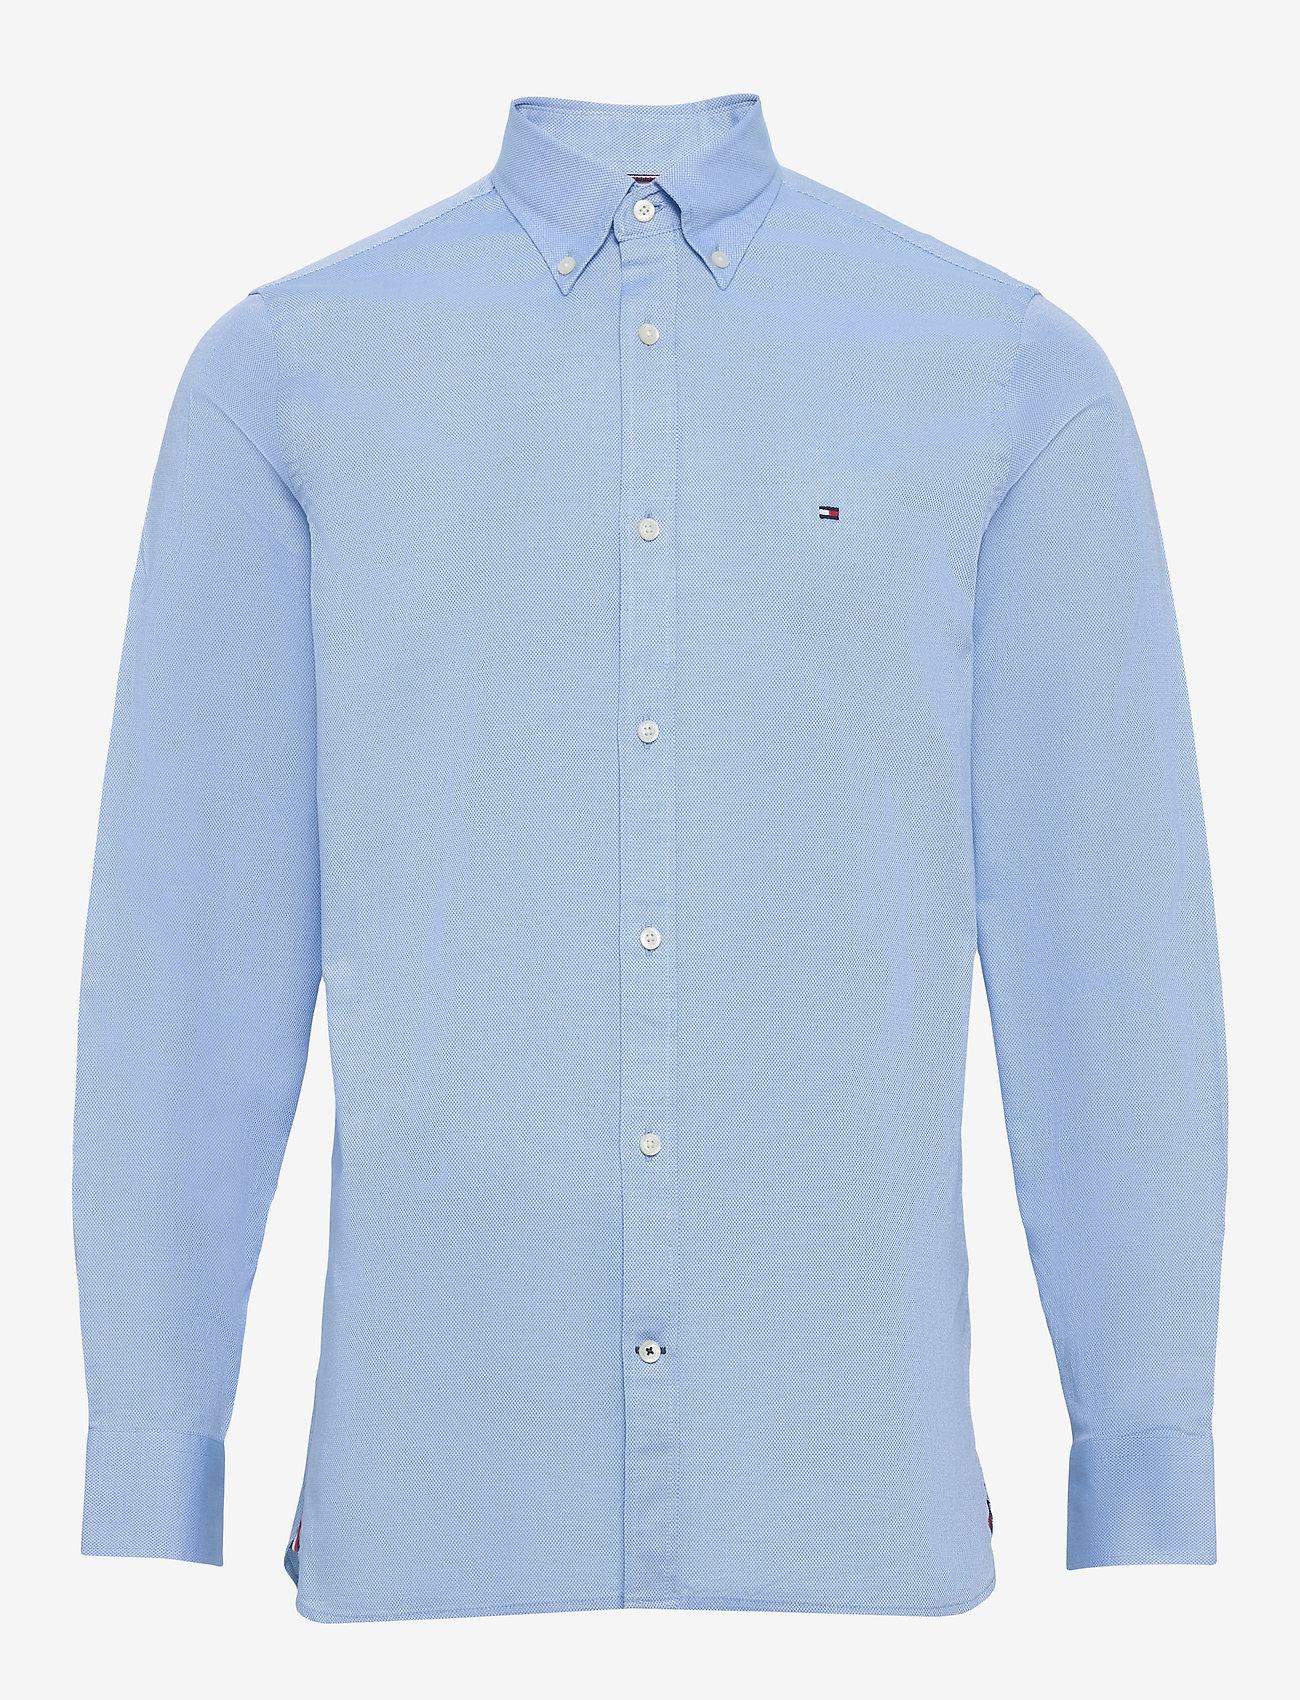 Tommy Hilfiger - SLIM FLEX ESSENTIAL DOBBY SHIRT - basic skjorter - copenhagen blue - 0